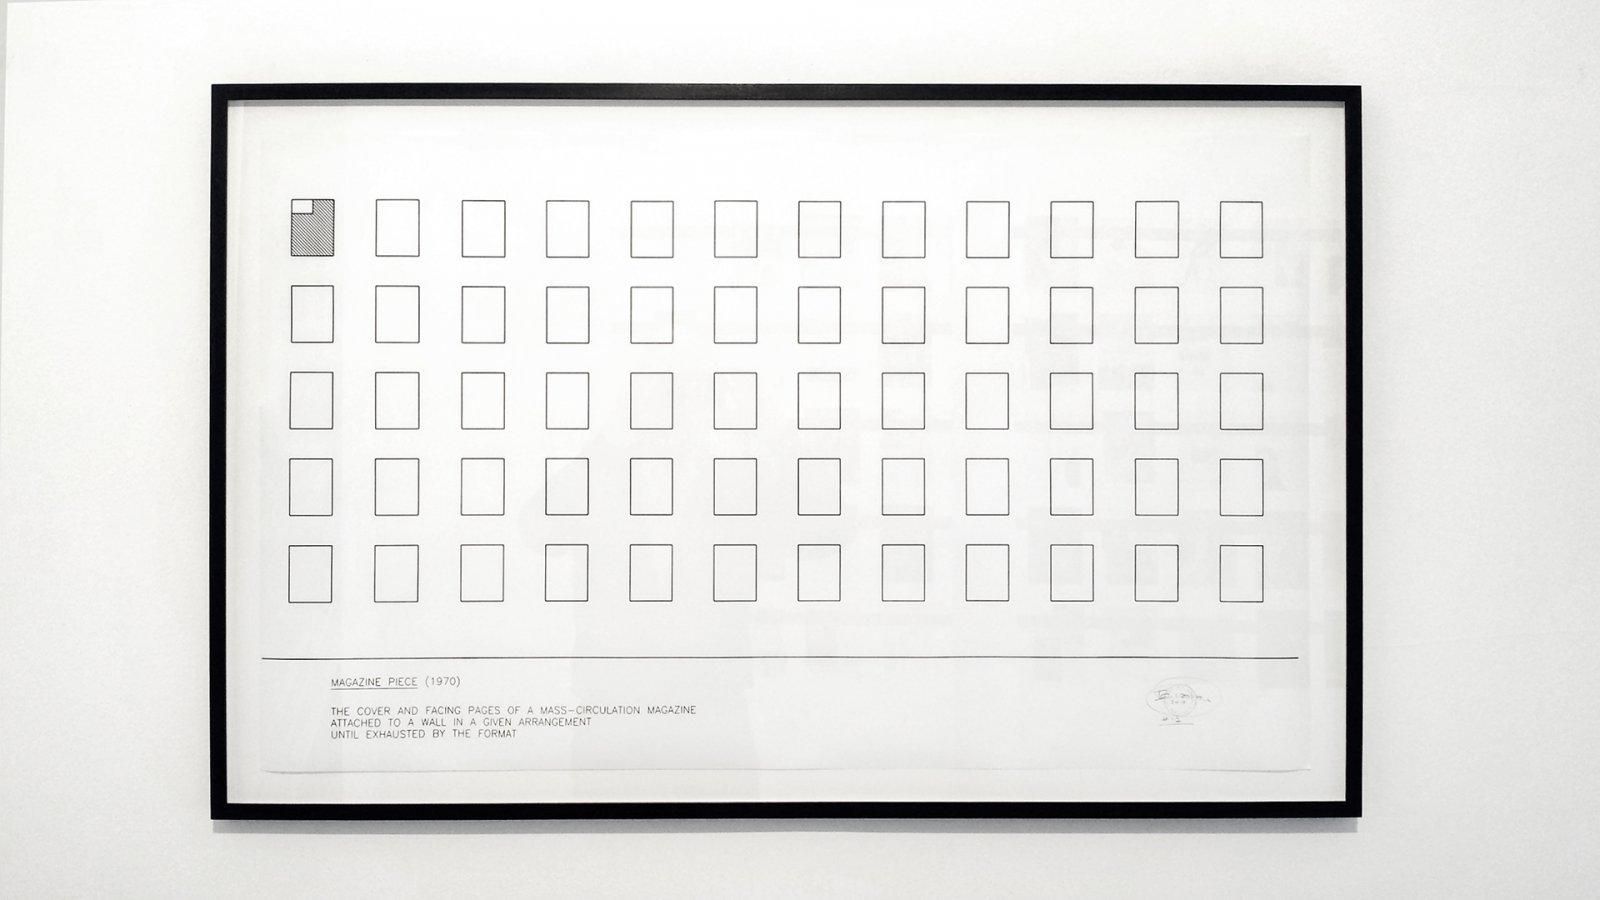 Ian Wallace,Magazine Piece Schema, 1970, ink on vellum, 24 x 40 in. (62 x 102 cm)